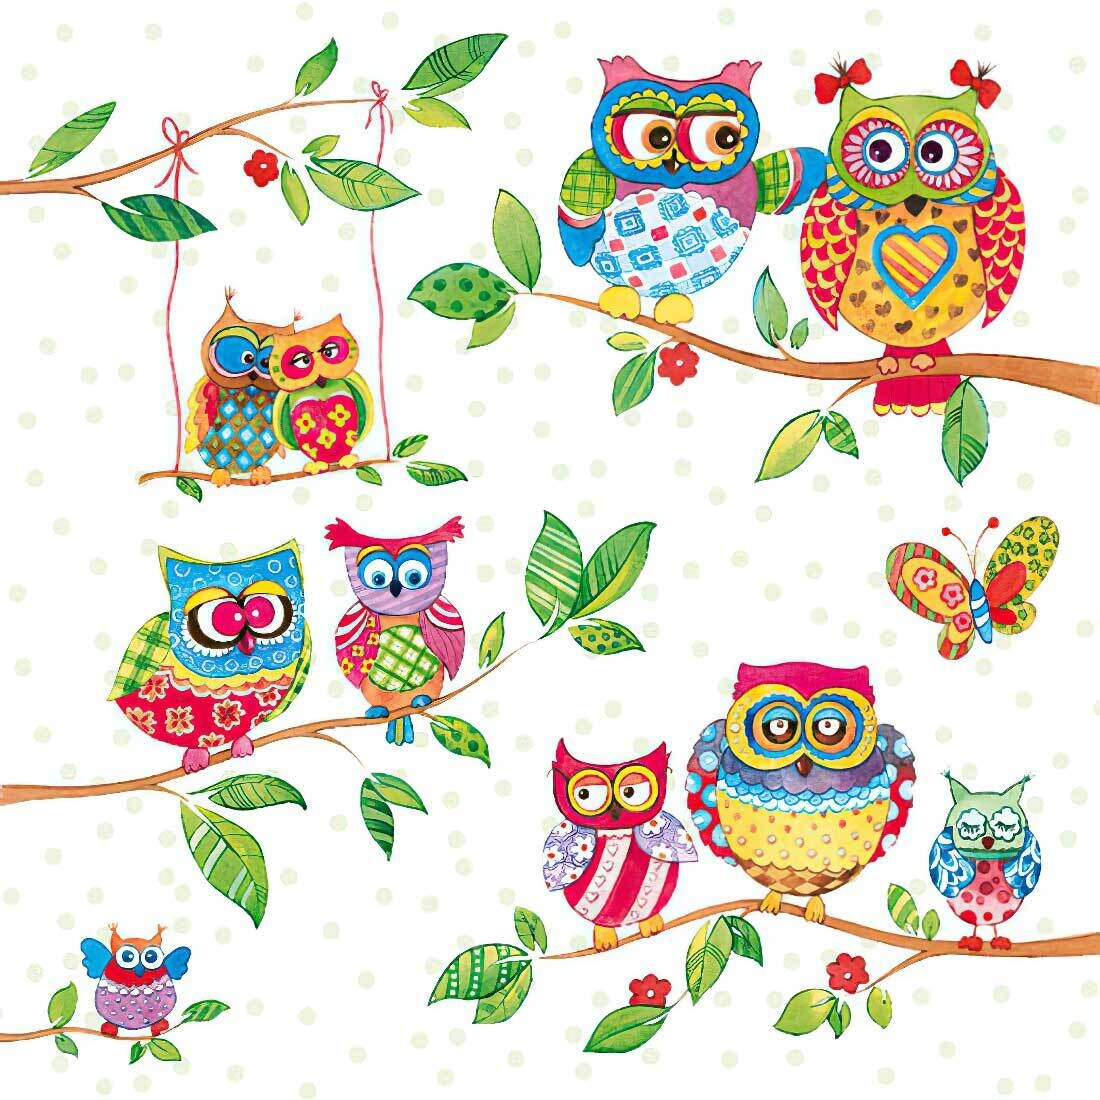 Decoupage Paper Napkins - Bird - Owls In Summerland (1 Sheet)